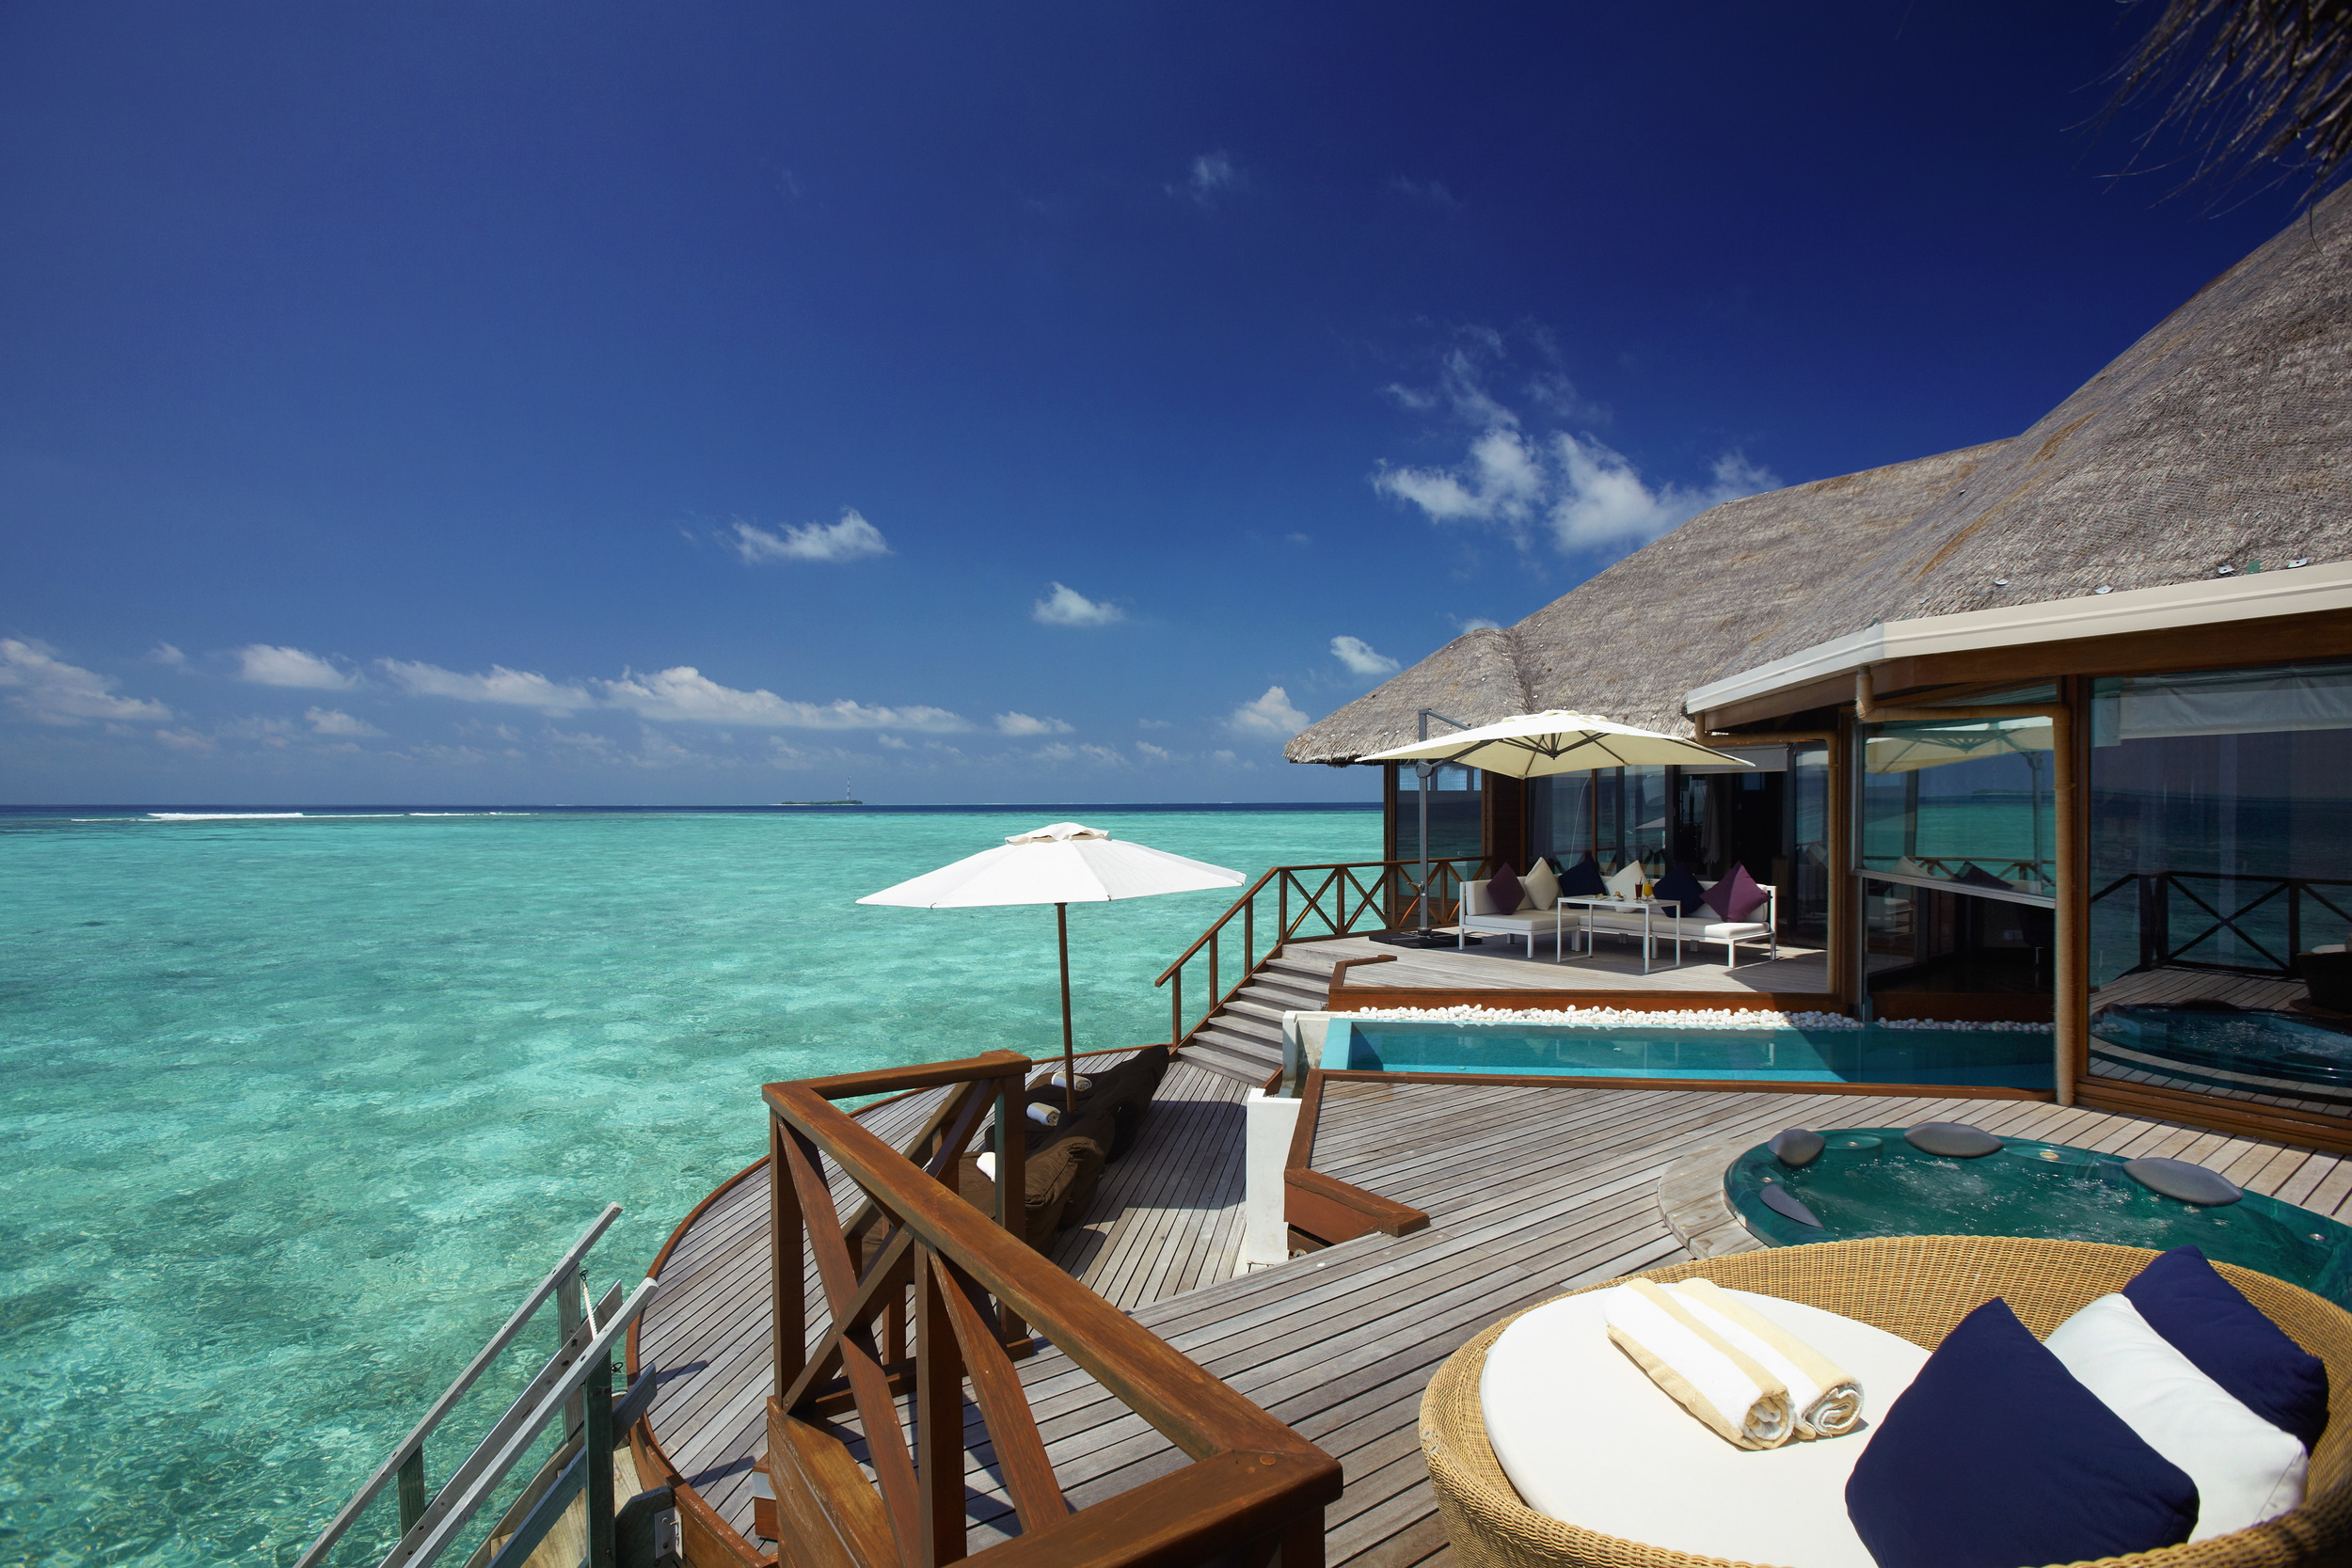 Hi_PHUV_64880480_Ocean_Pavilion_with_Private_Pool_(seaview).jpg